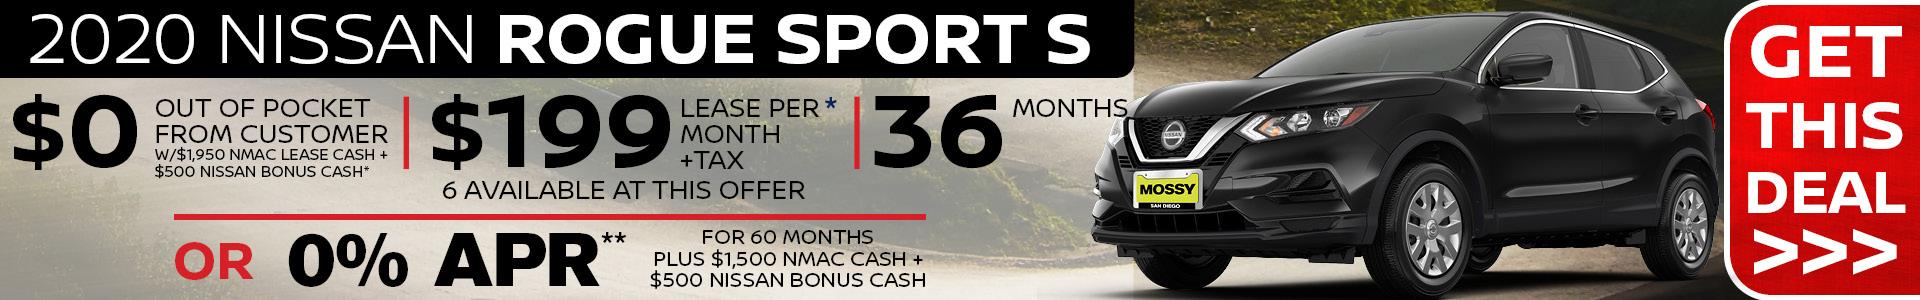 Mossy Nissan - Rogue Sport SRP